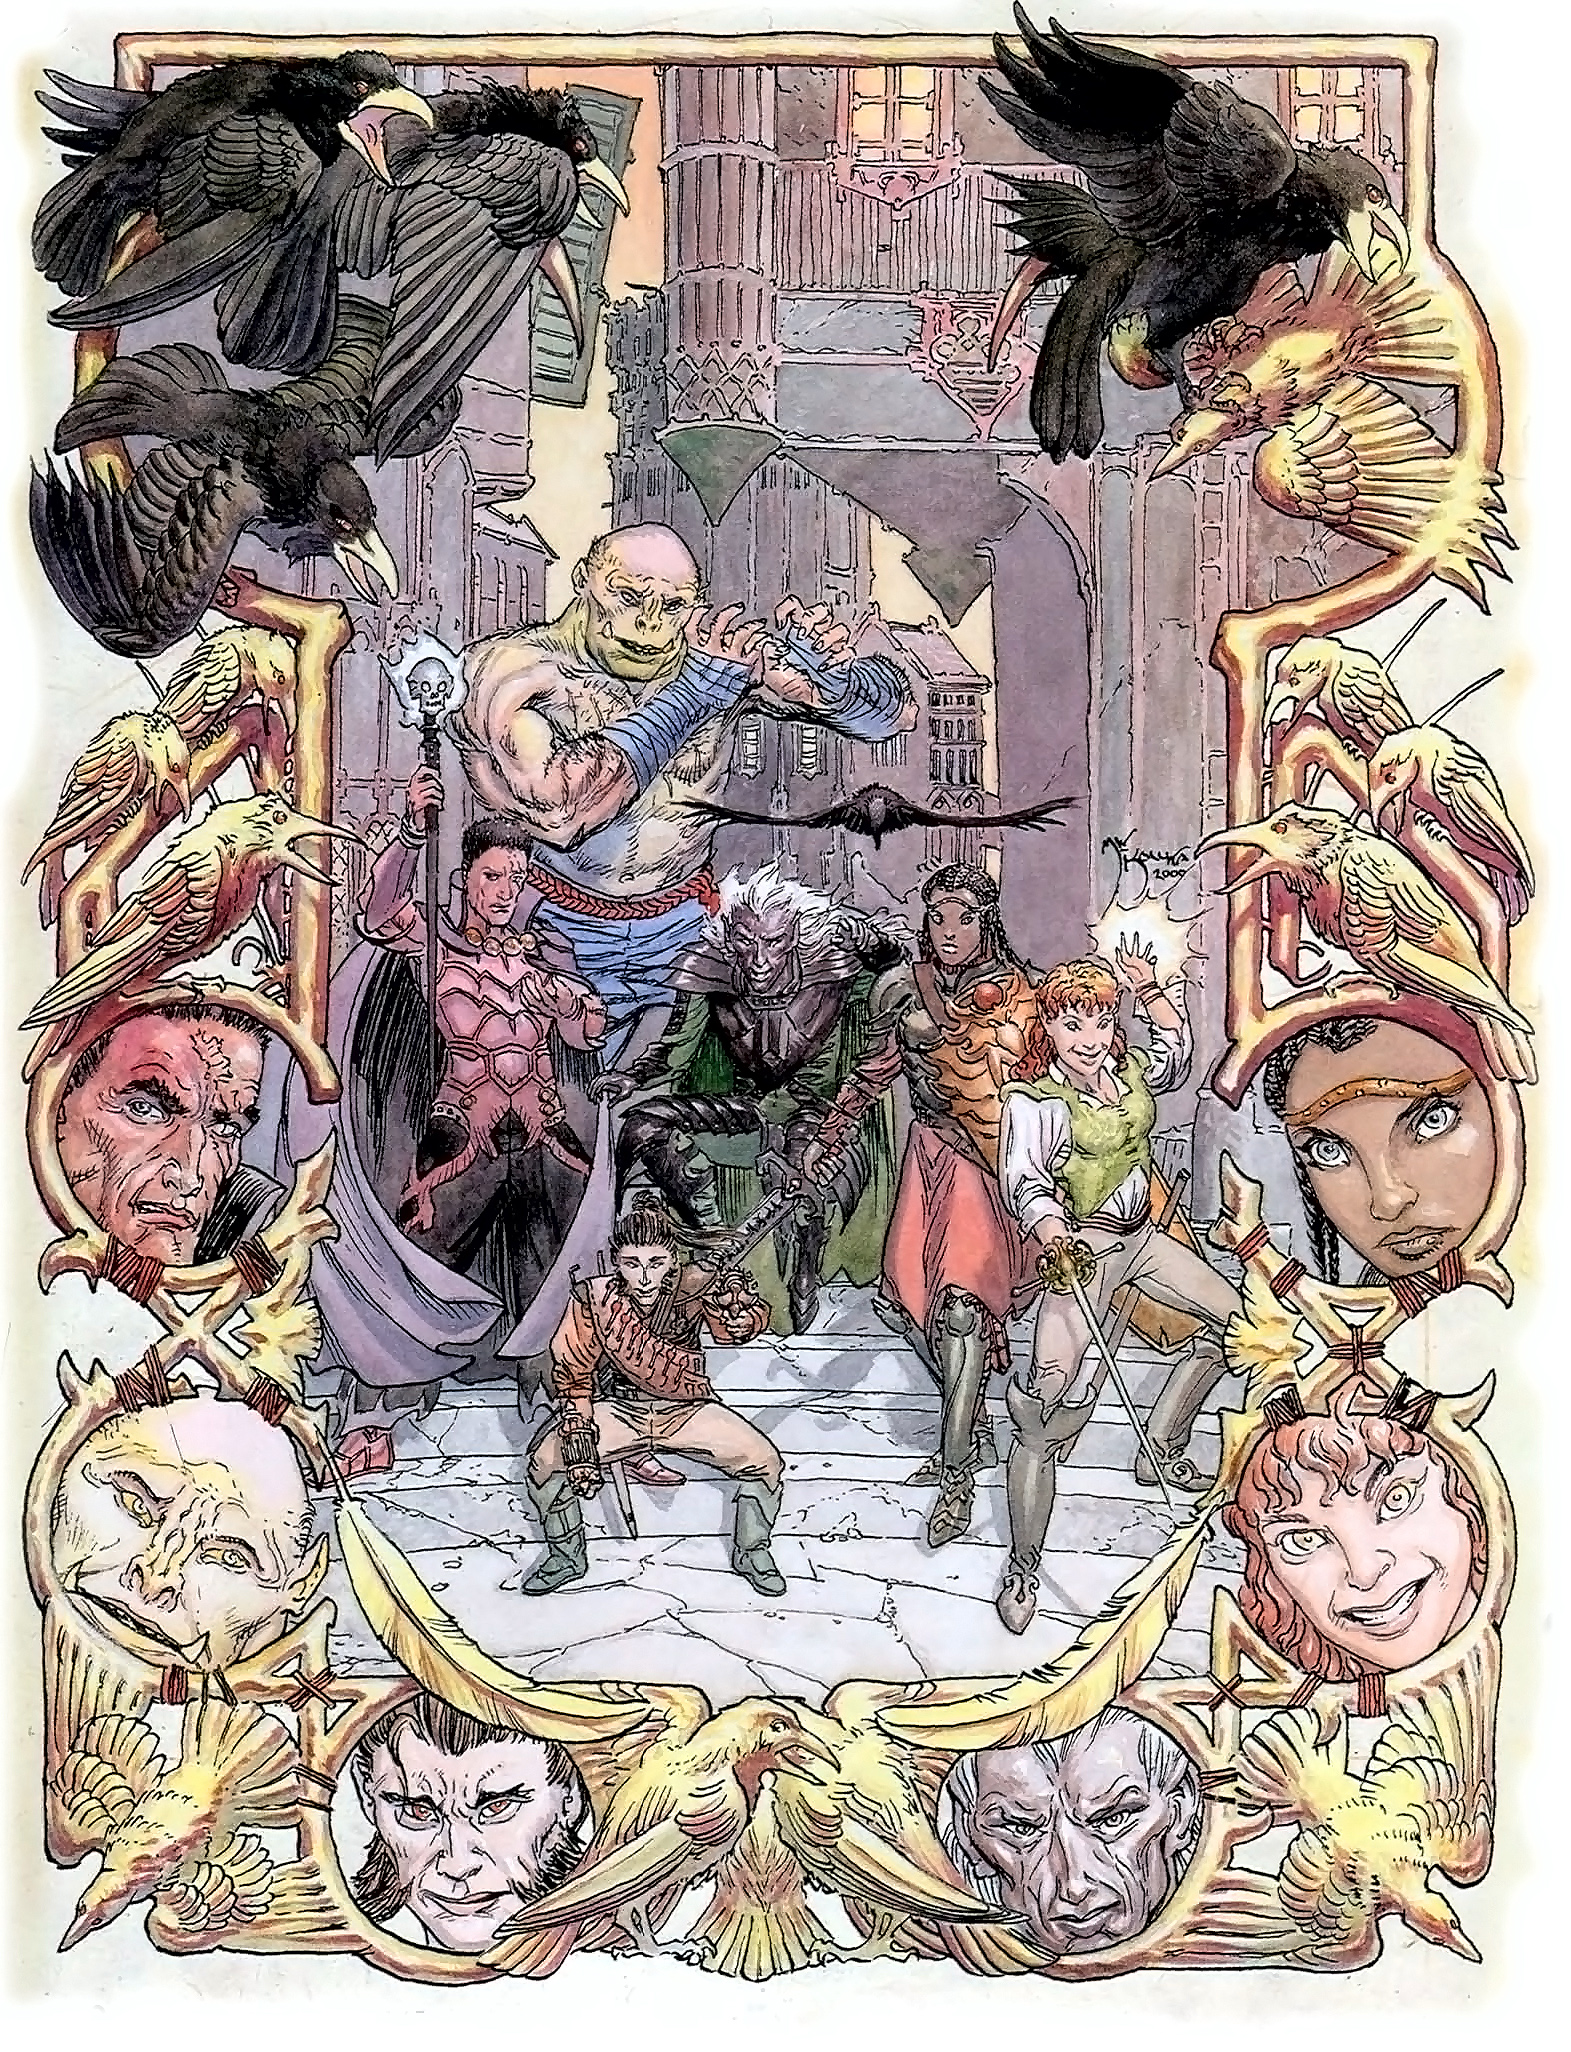 d&d dark elf half-elf half-orc halfling Drow, halfling, mezzelfo, mezzorco... TSR - Polyhedron Magazine #145 (2000-12) © Wizards of the Coast & Hasbro